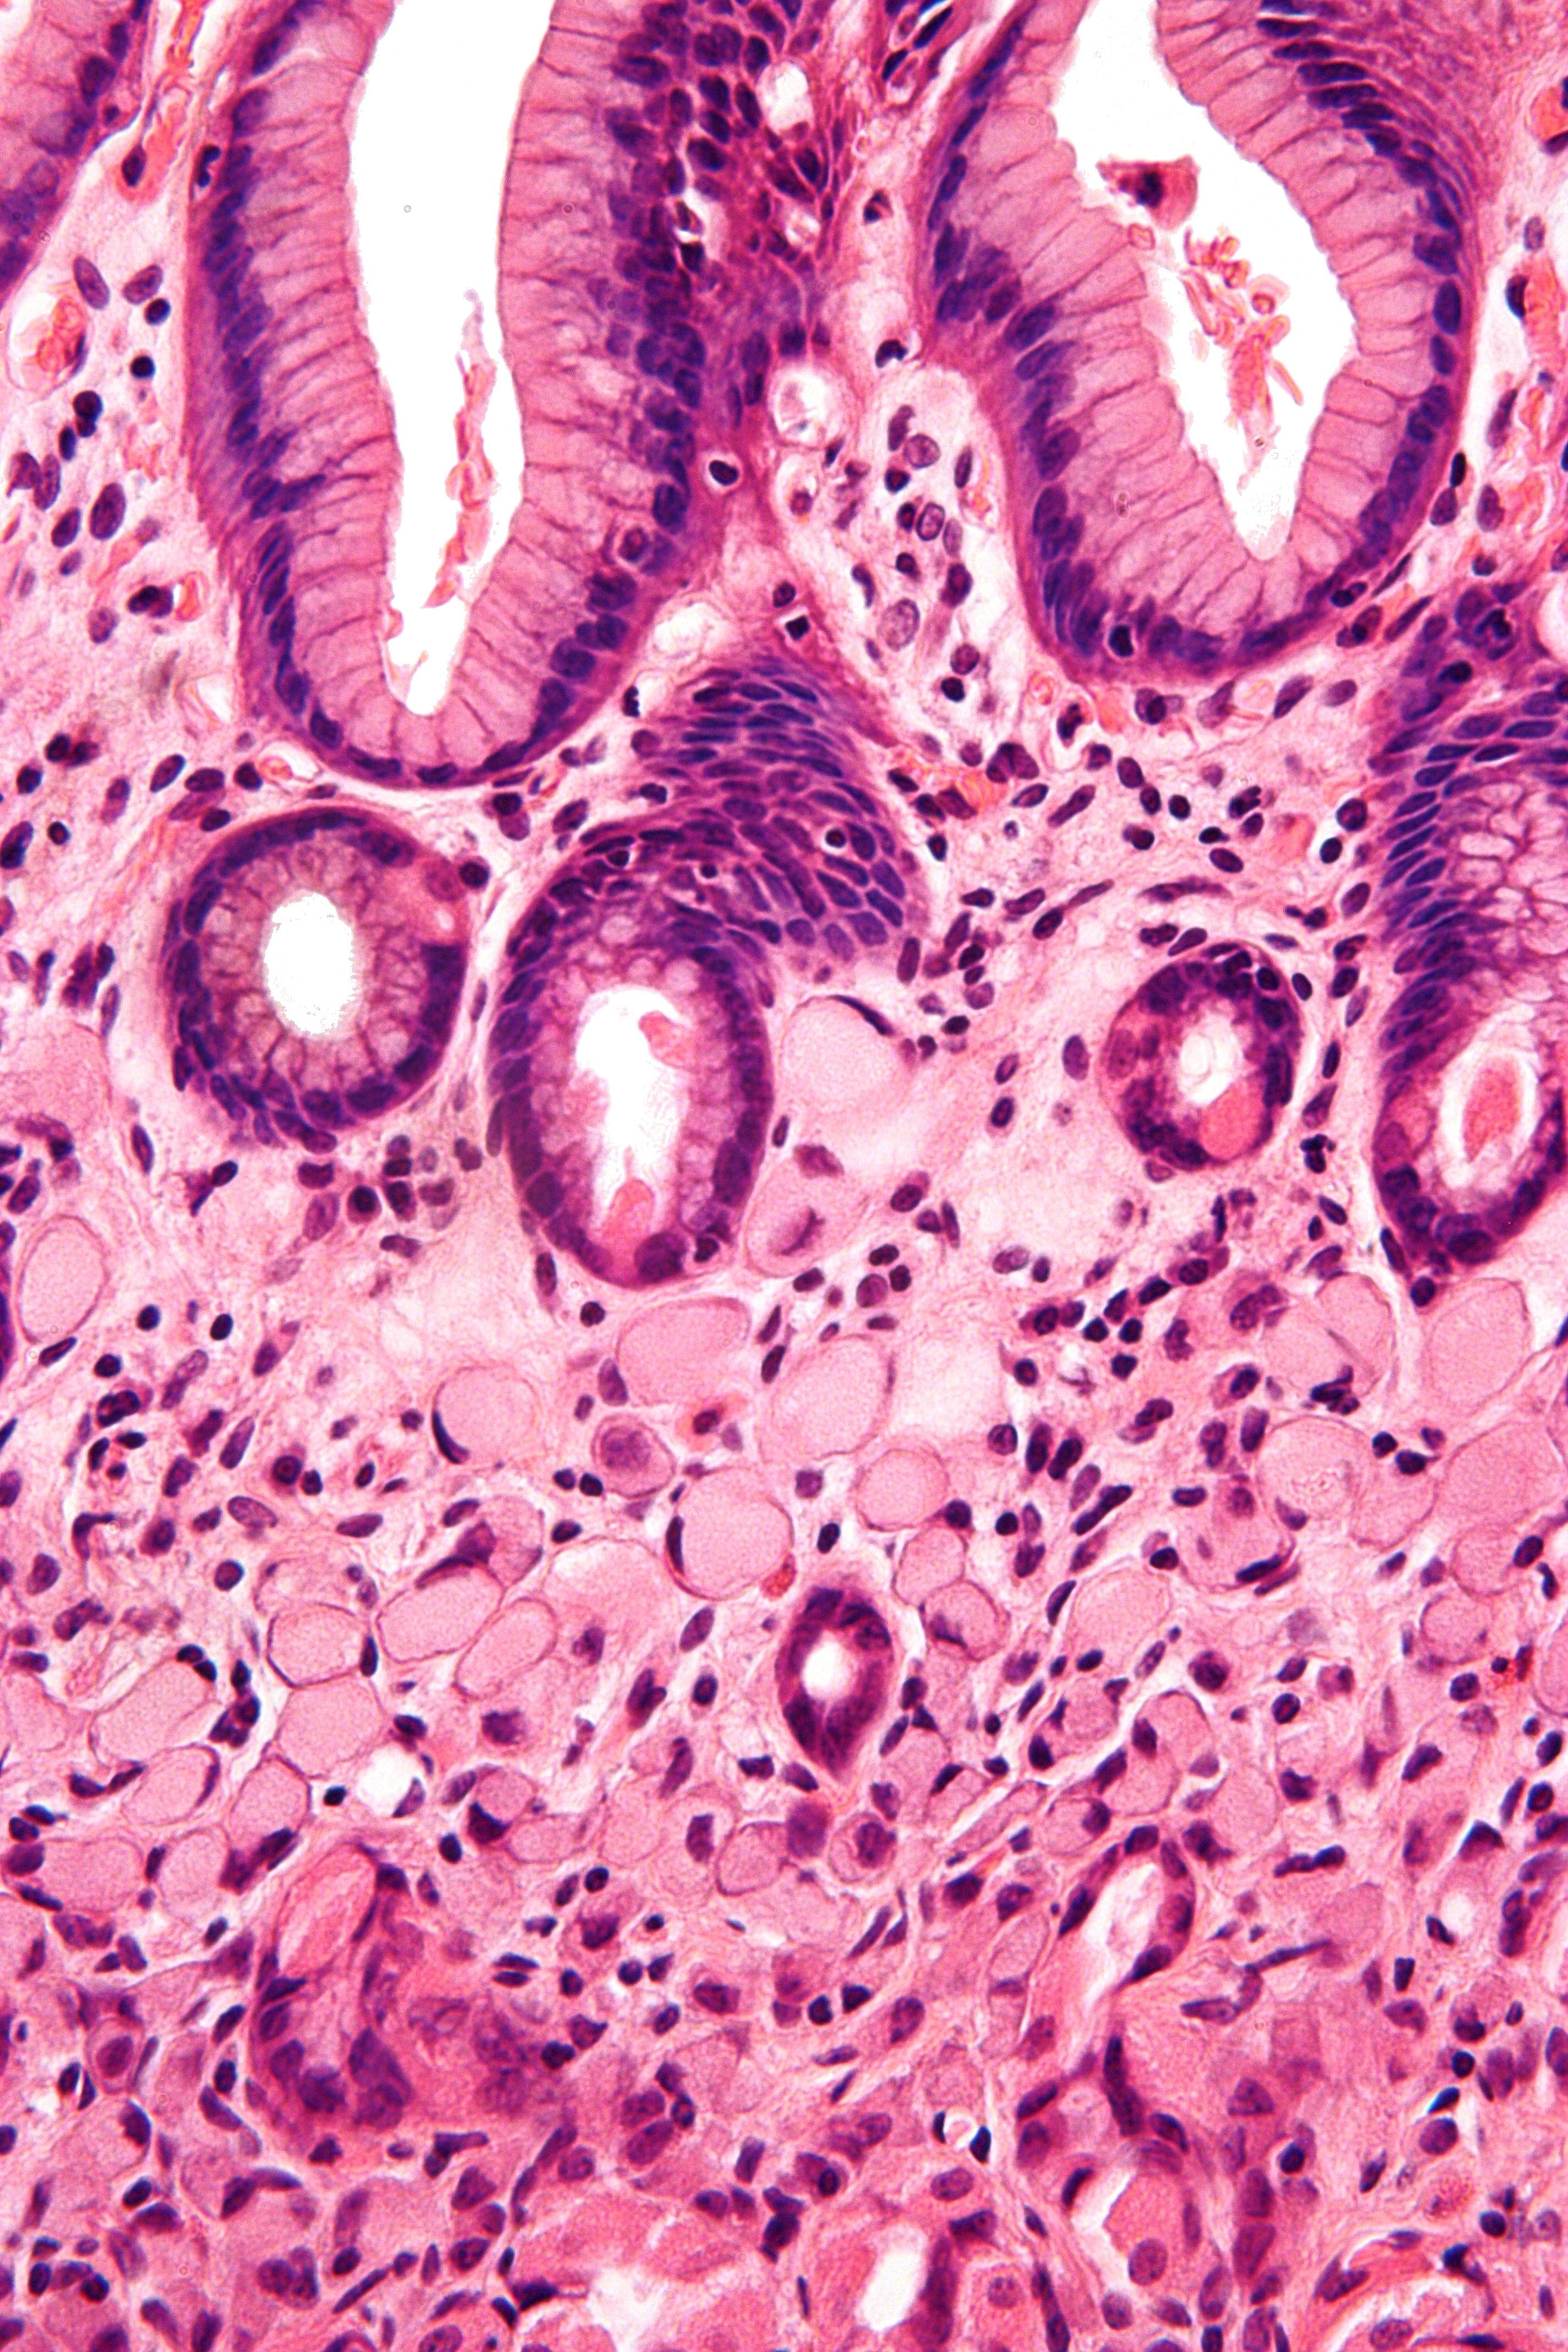 gastric cancer or adenocarcinoma